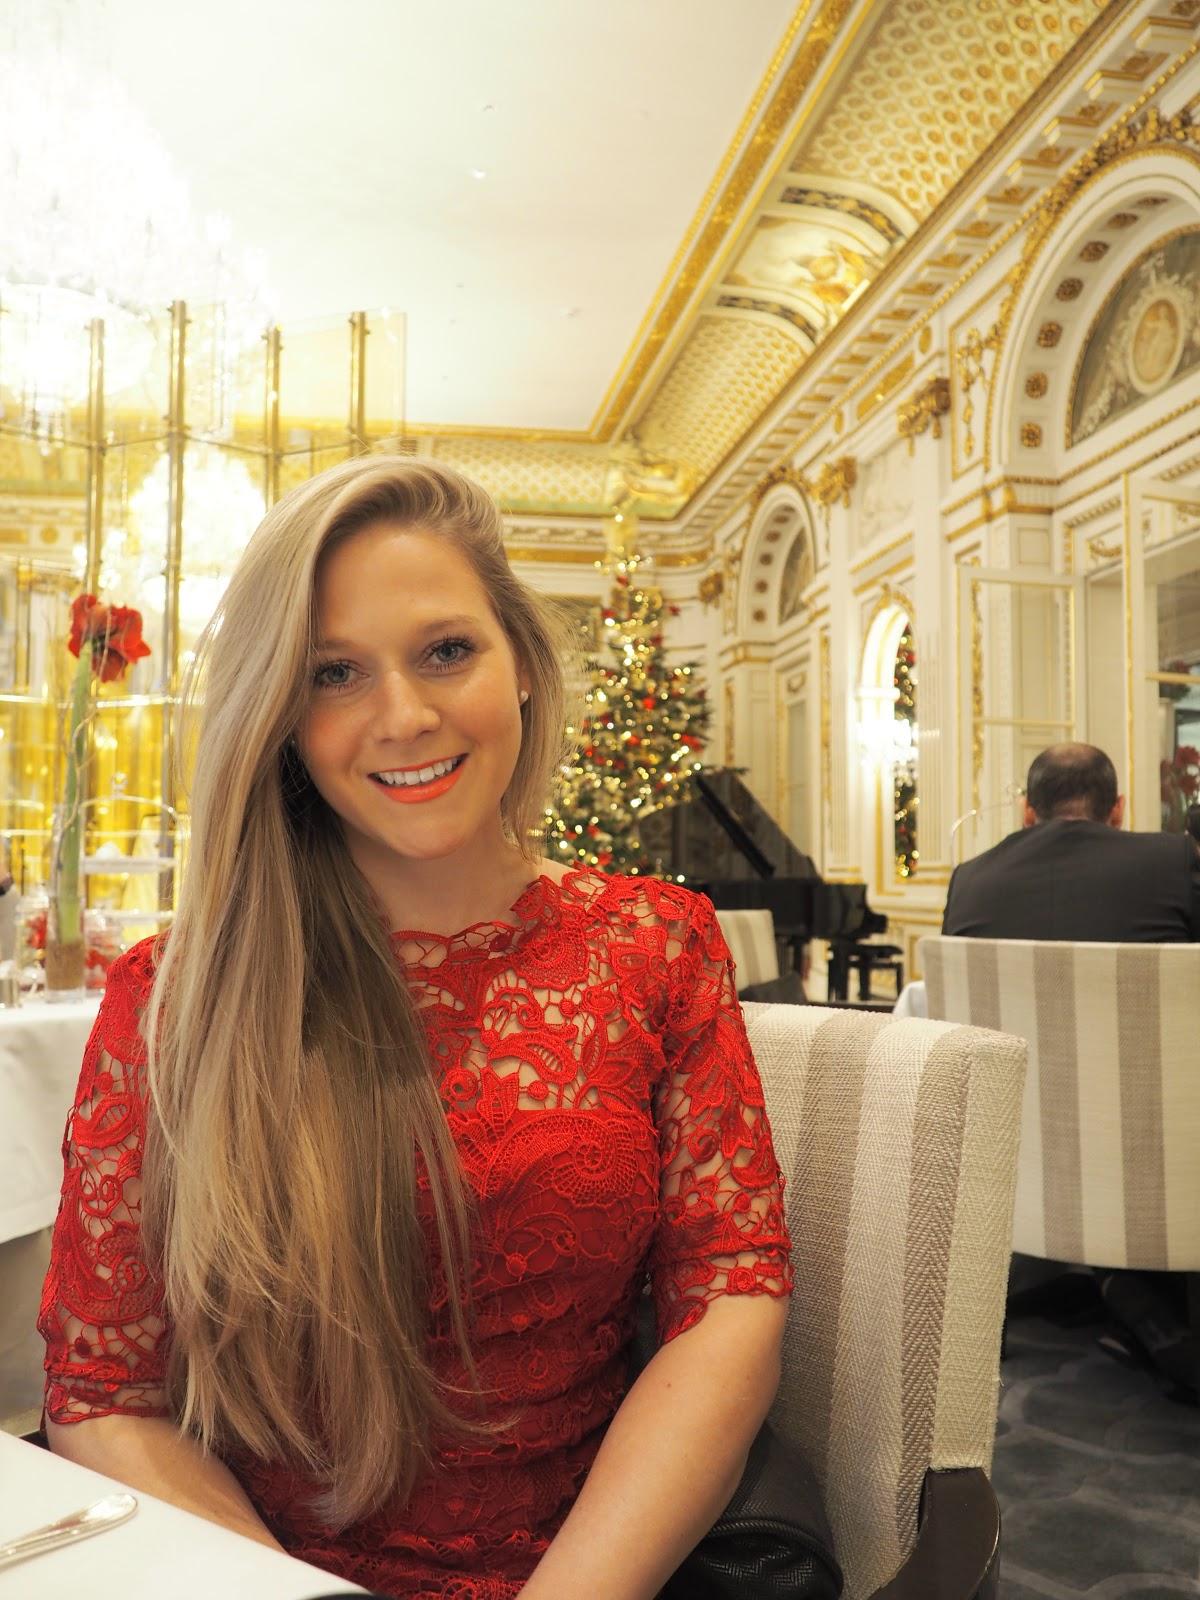 Peninsula Hotel, Paris, Afternoon Tea, Katie Matthews - blonde girl in red dress at afternoon tea